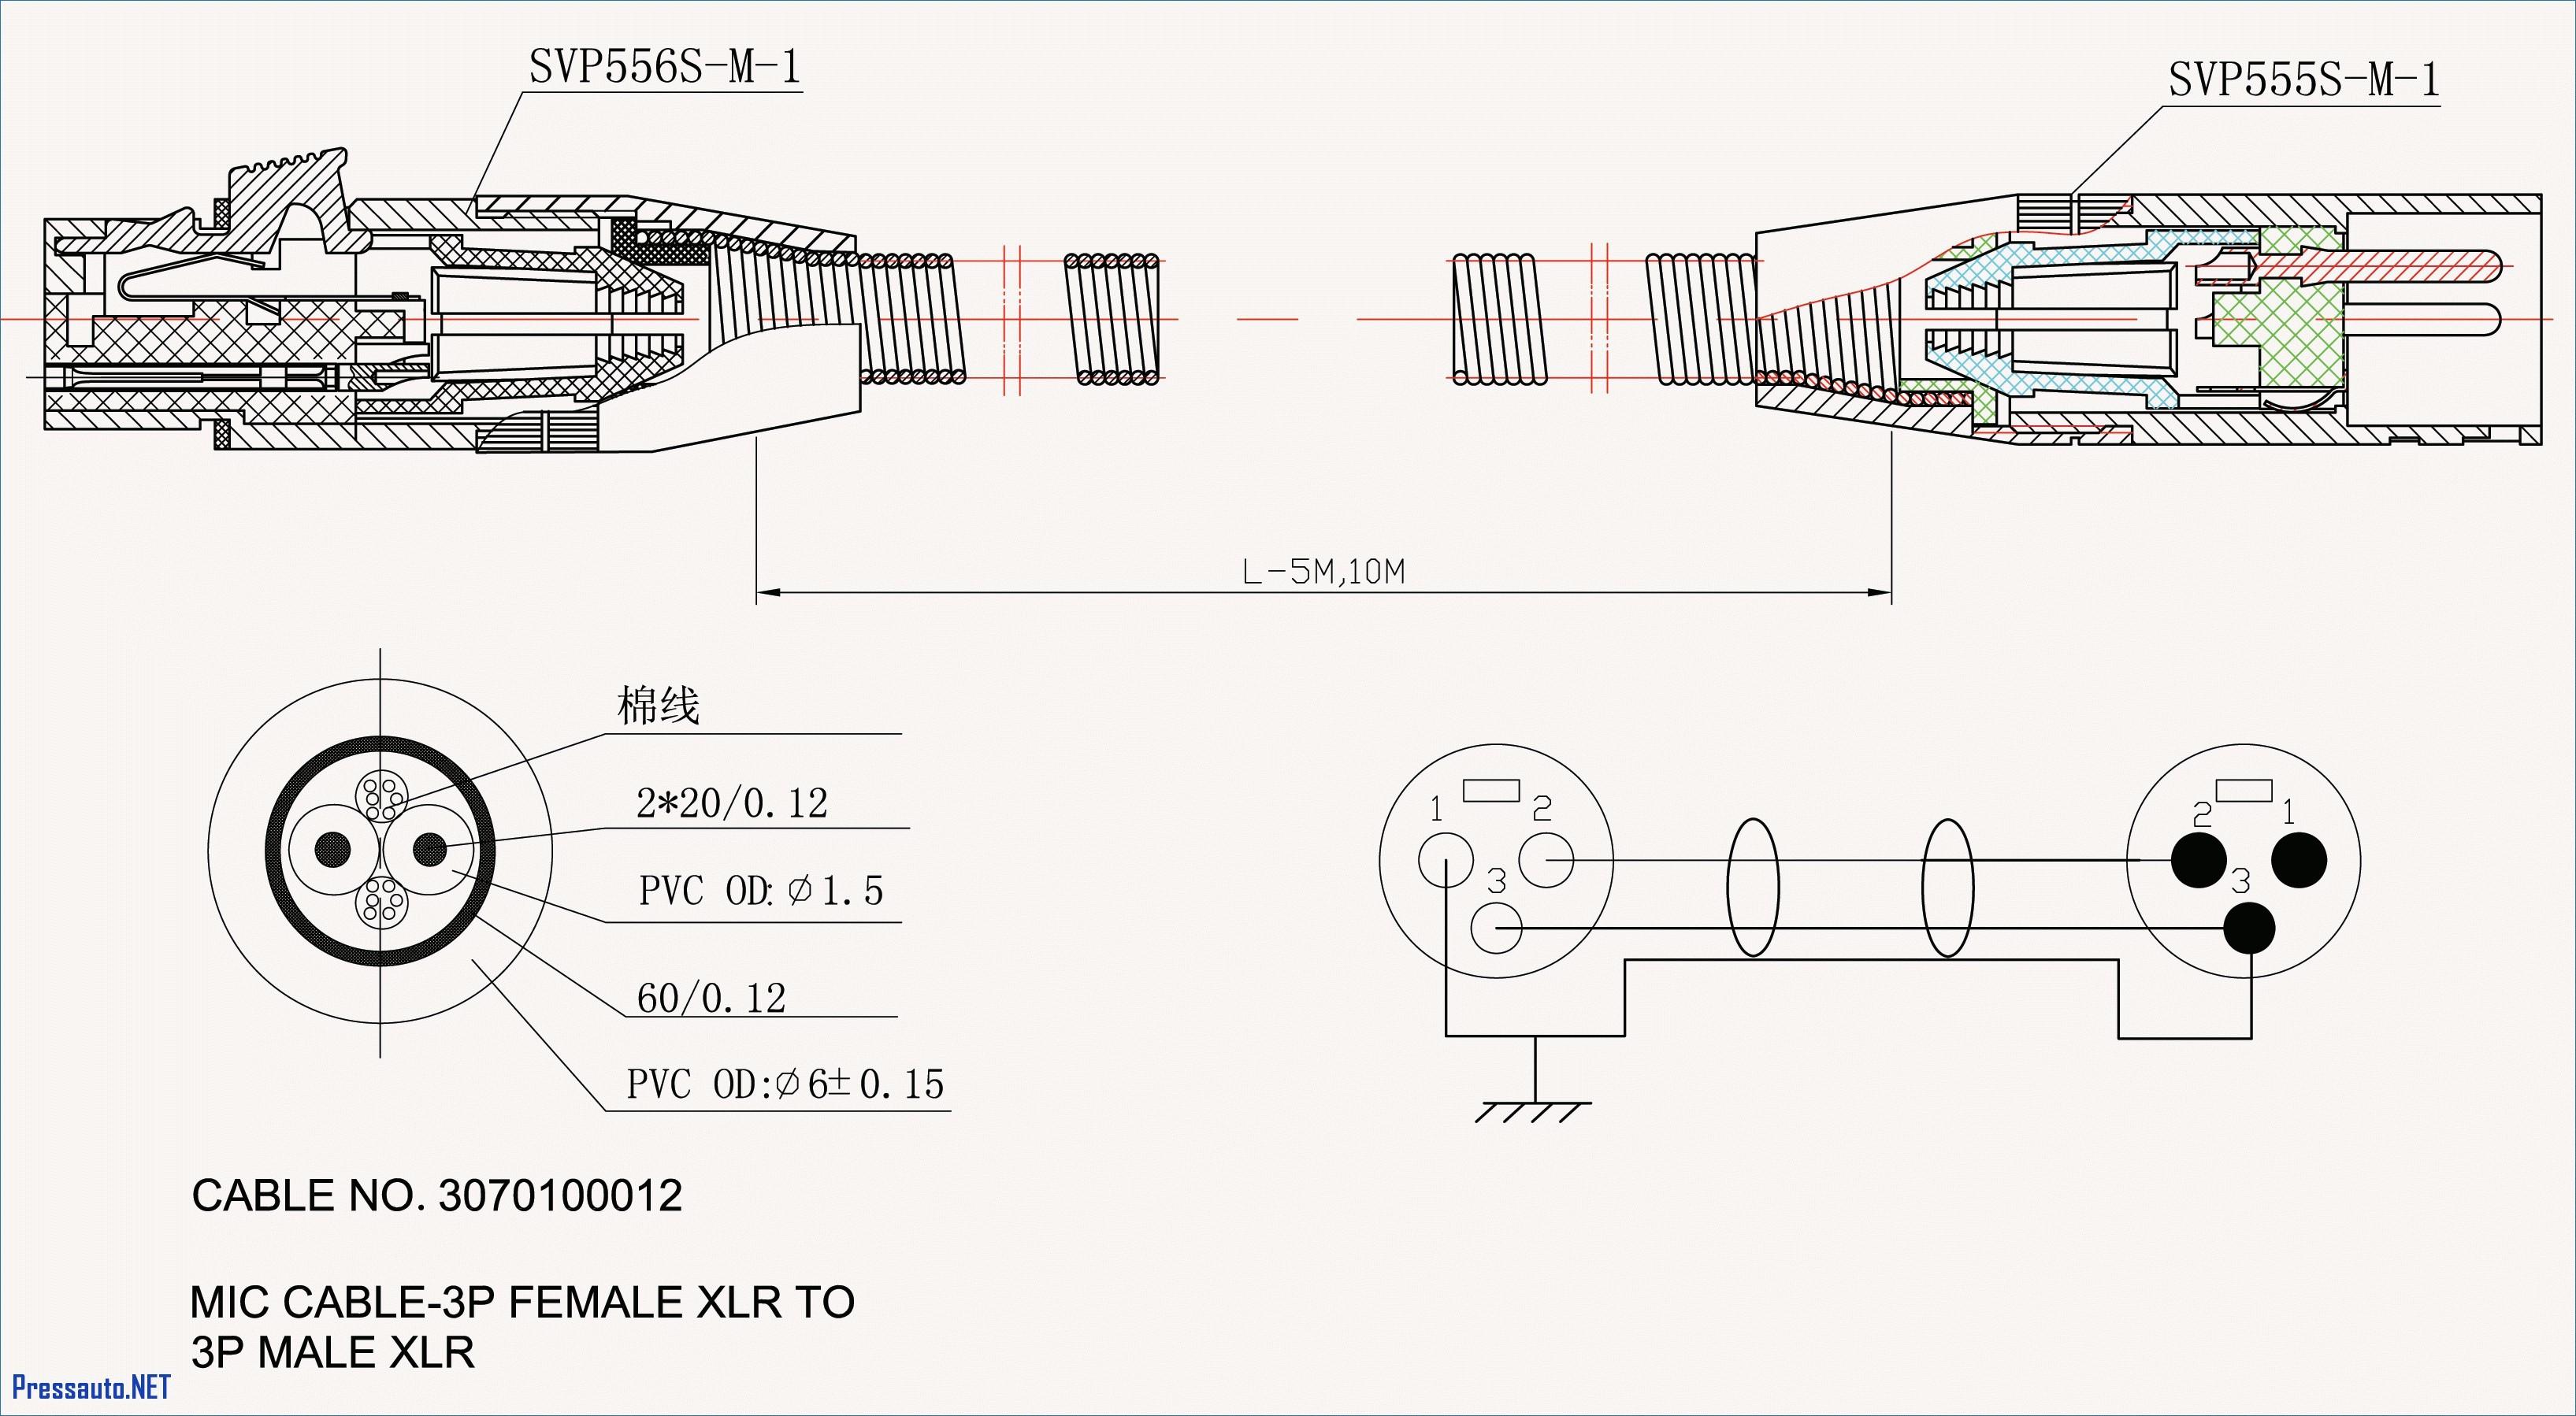 Dodge Durango Engine Diagram 2003 Durango Wiring Harness Wiring Diagram • Of Dodge Durango Engine Diagram